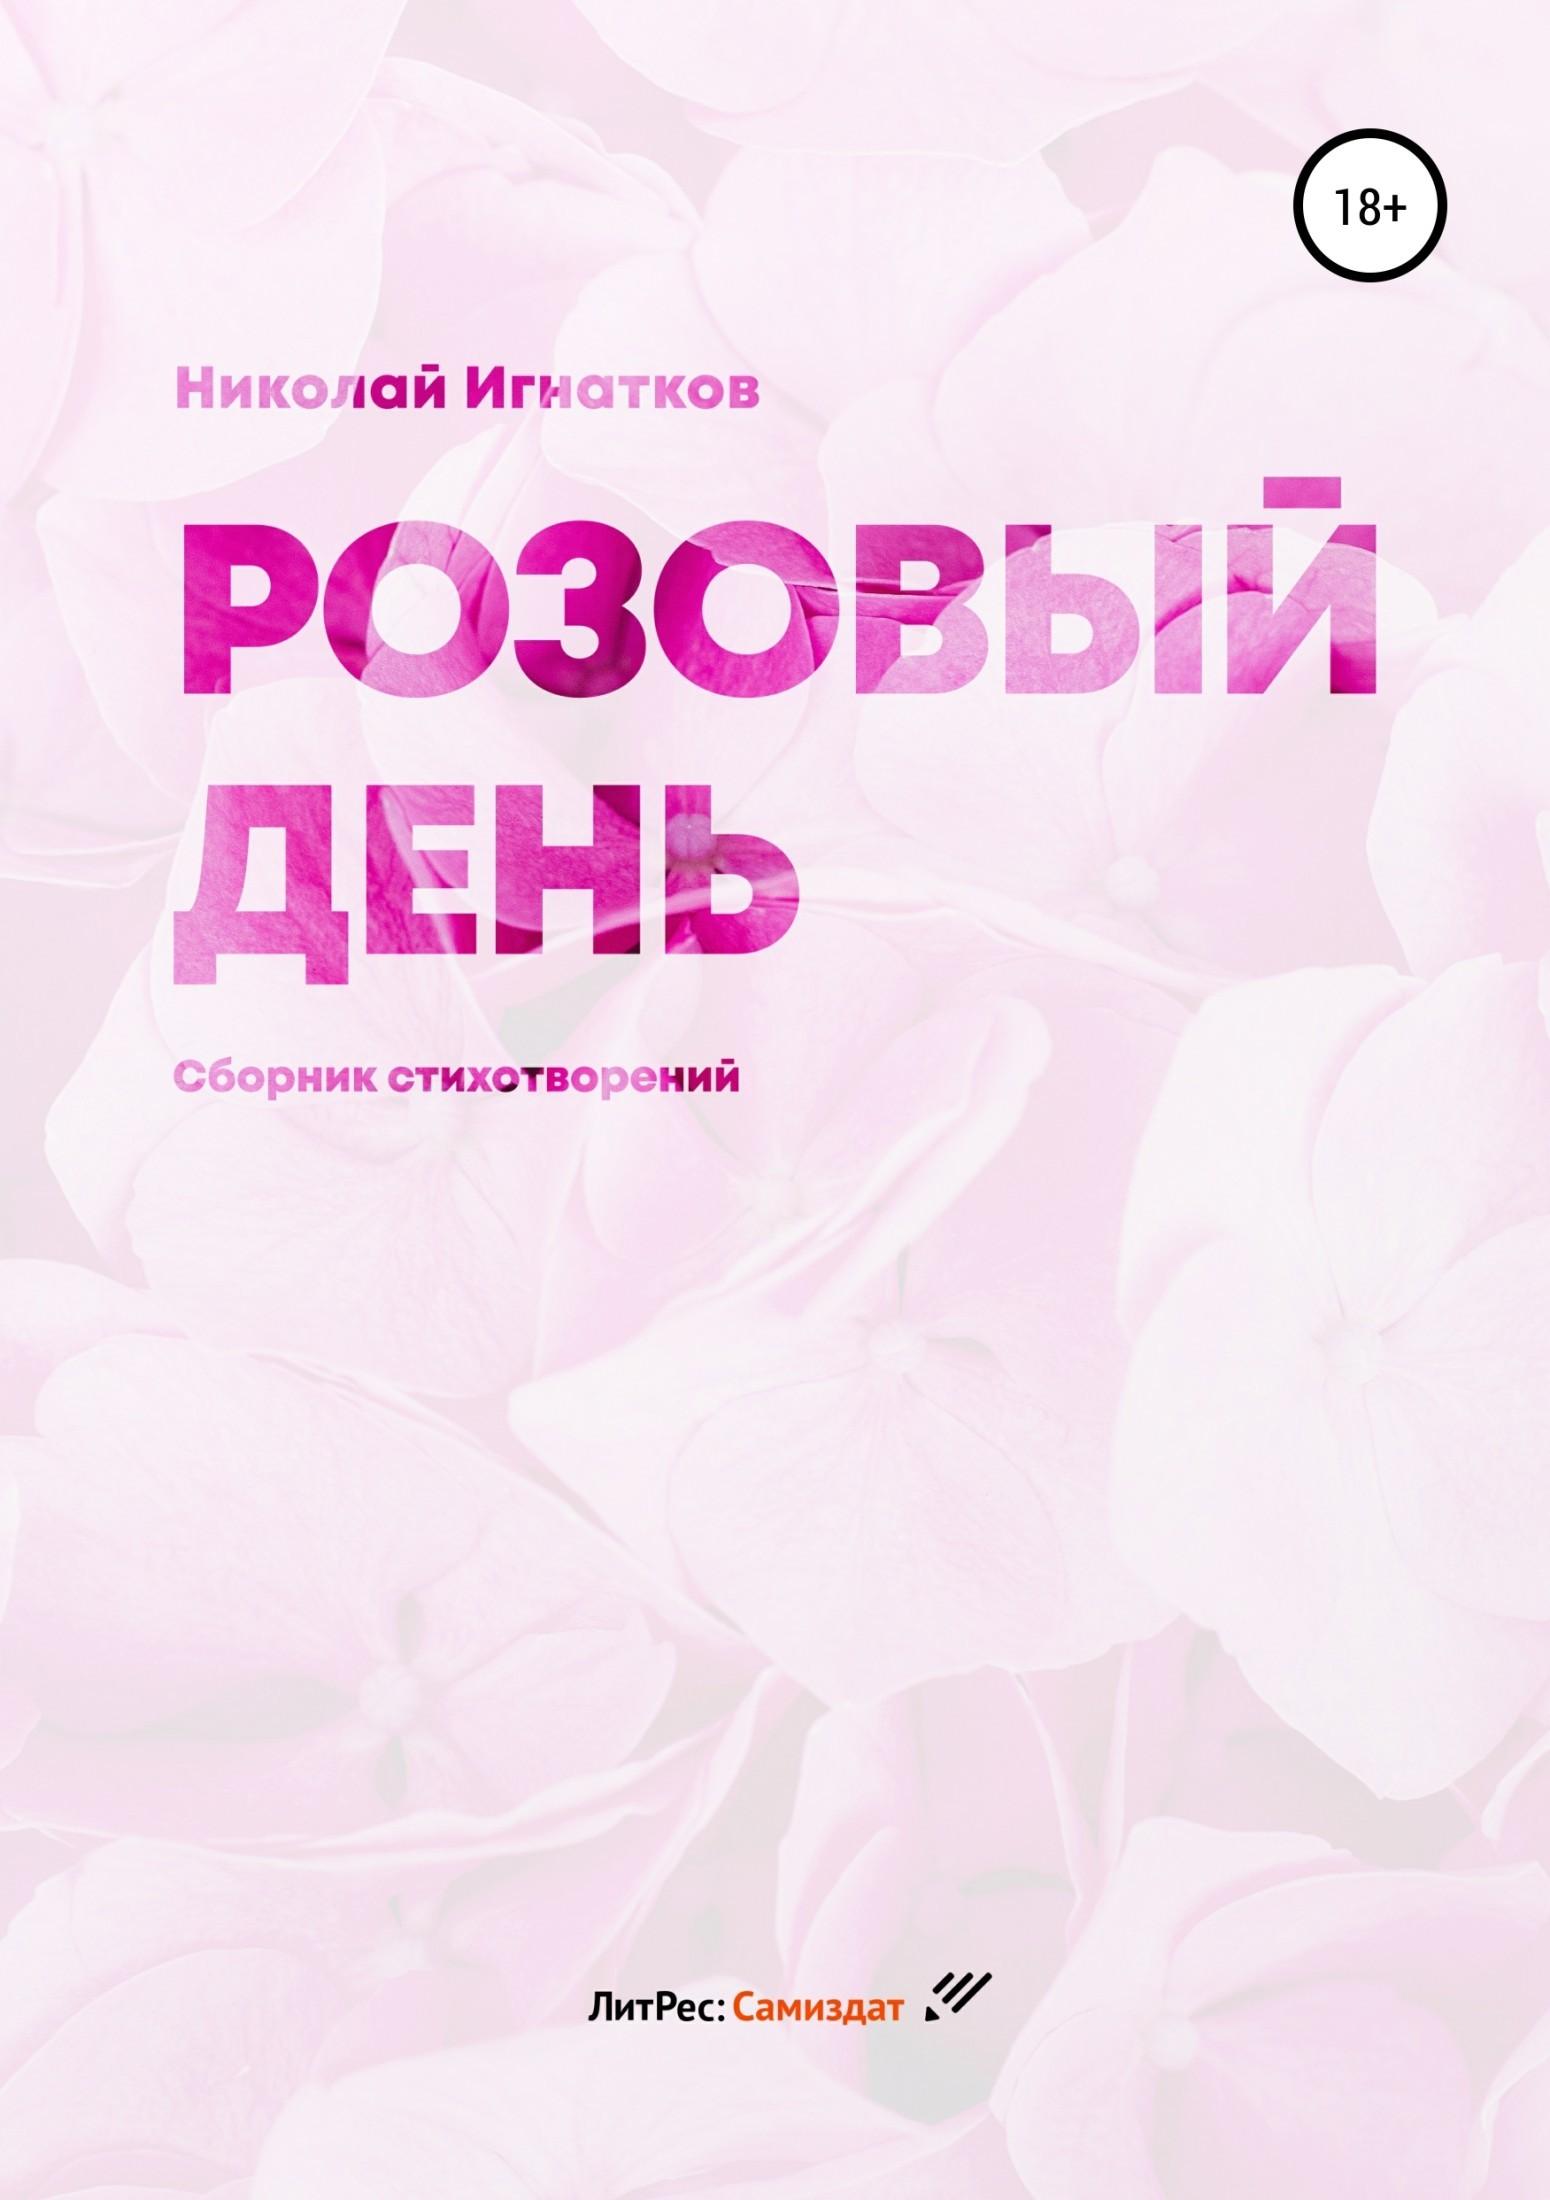 Николай Викторович Игнатков Розовый день. Сборник стихотворений цена